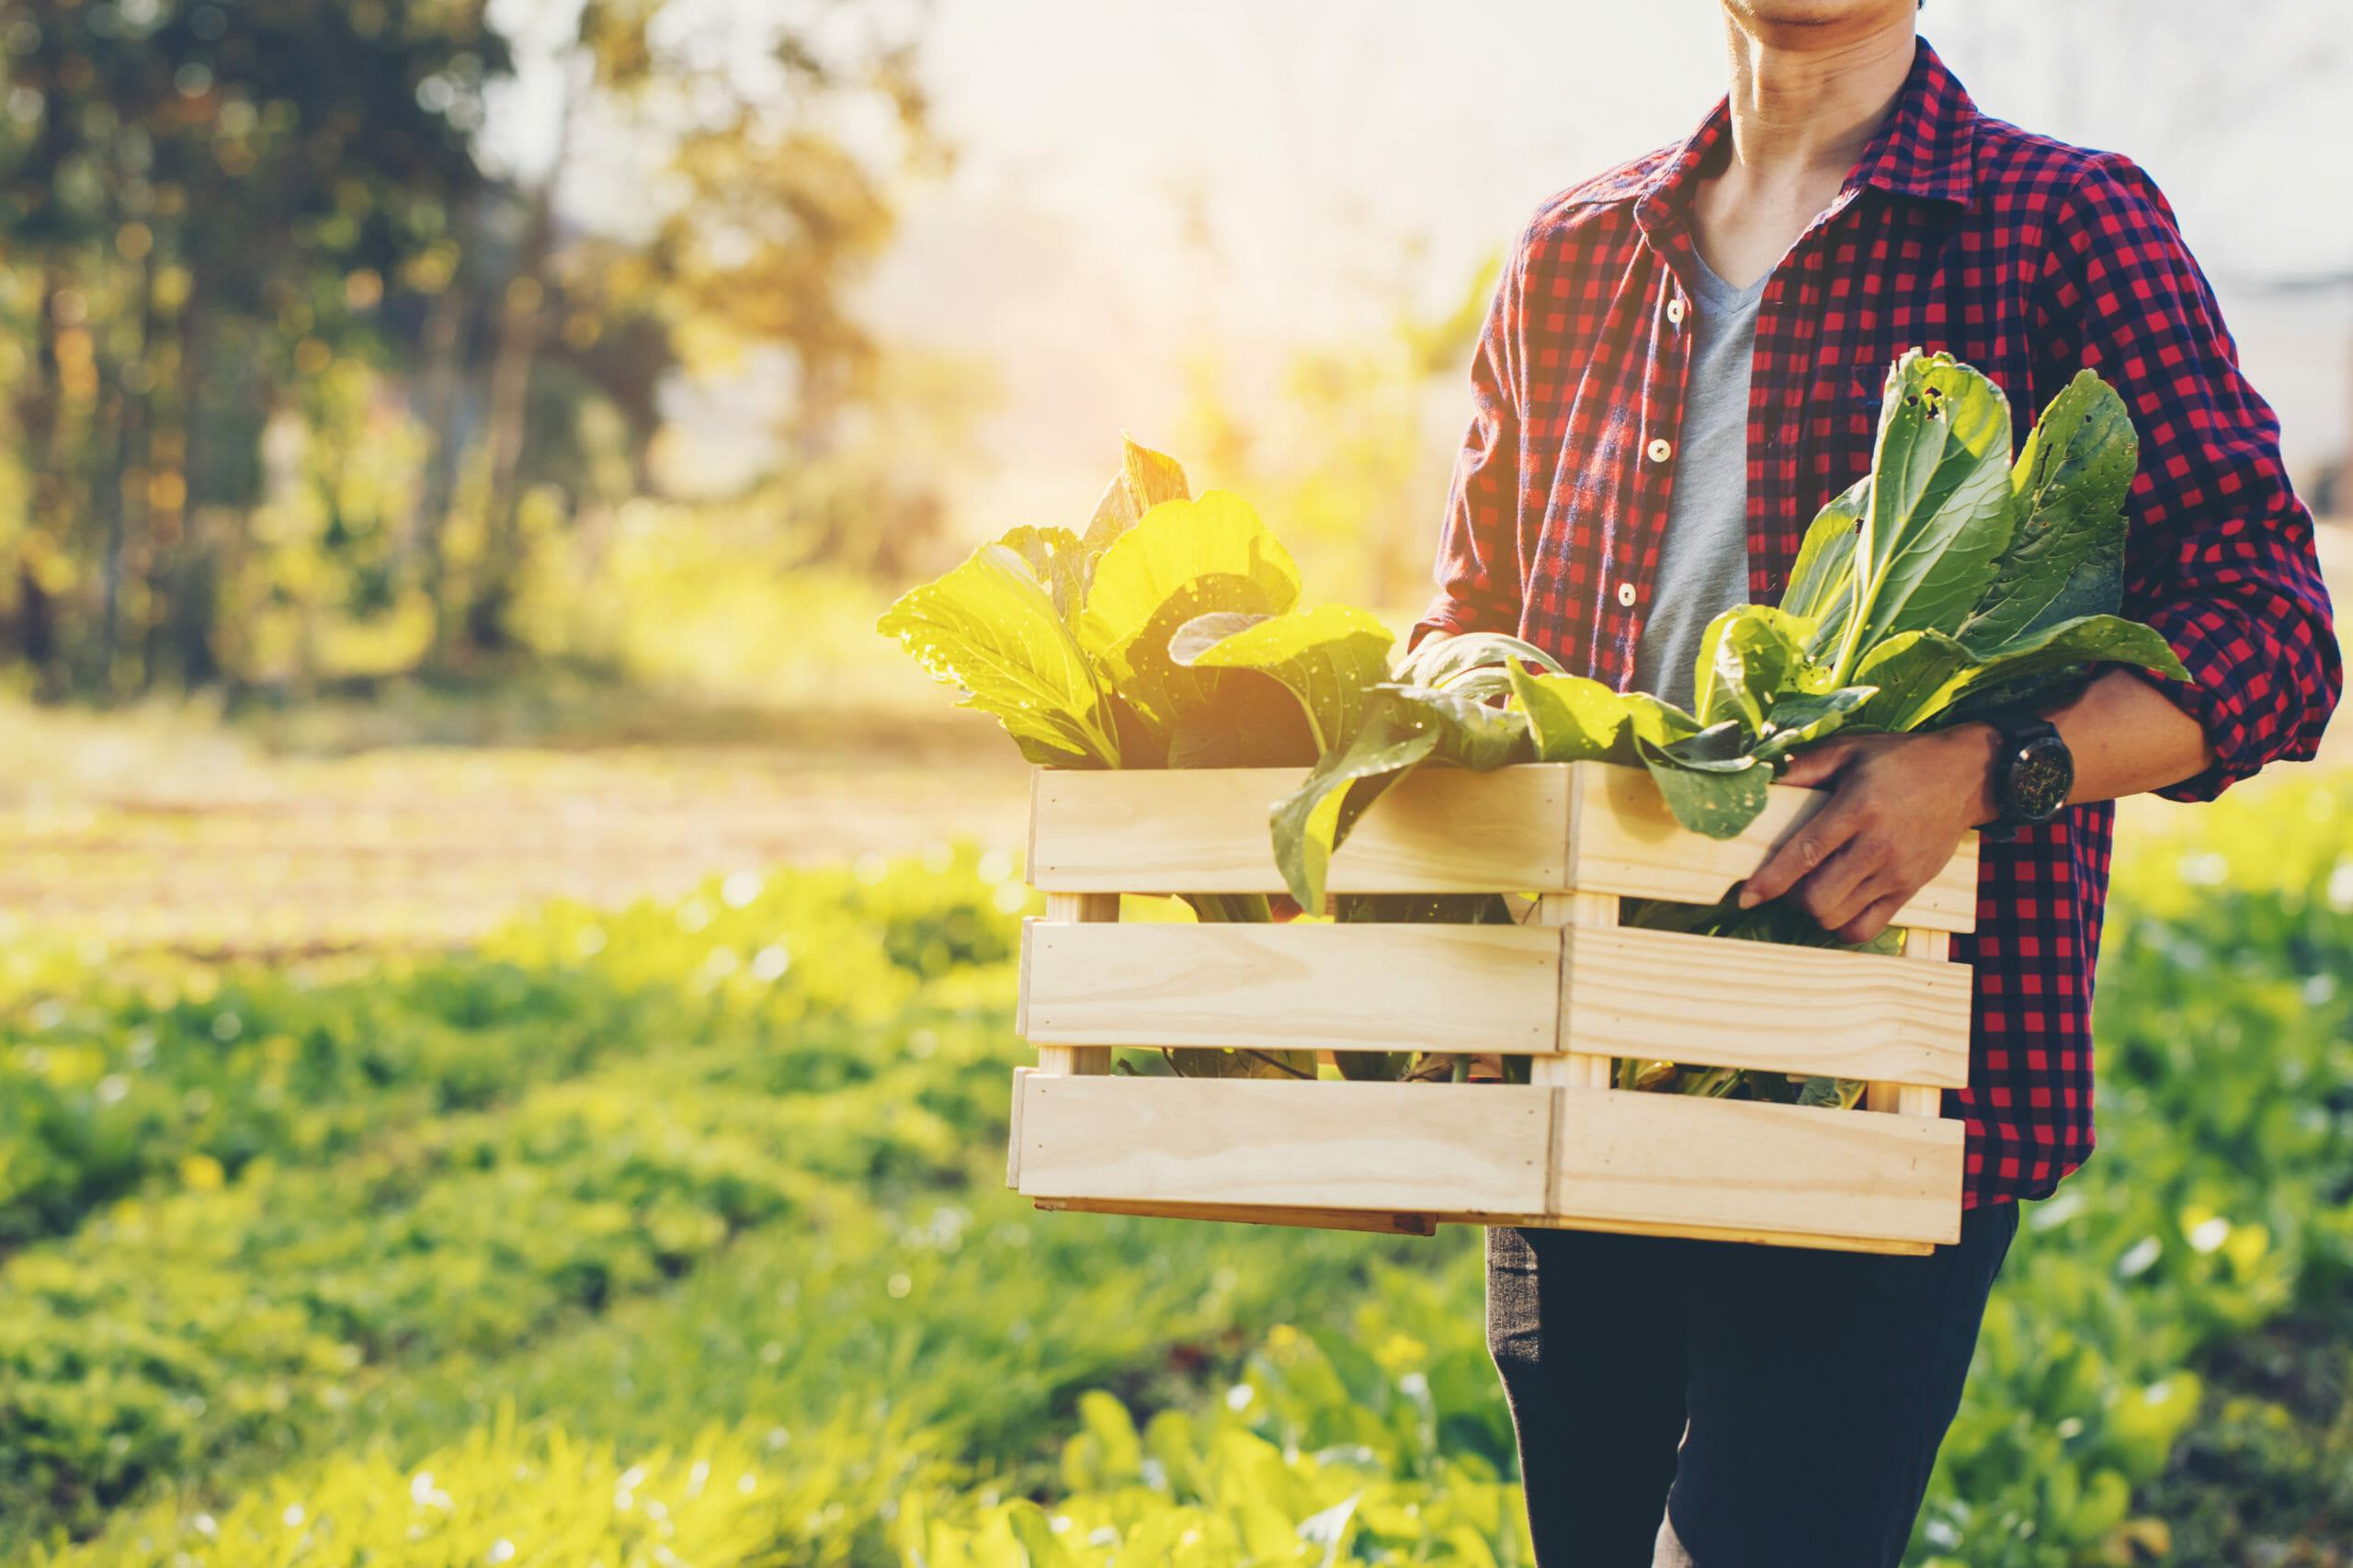 farmer-holding-crate-bio-vegetables-farm-1648630270